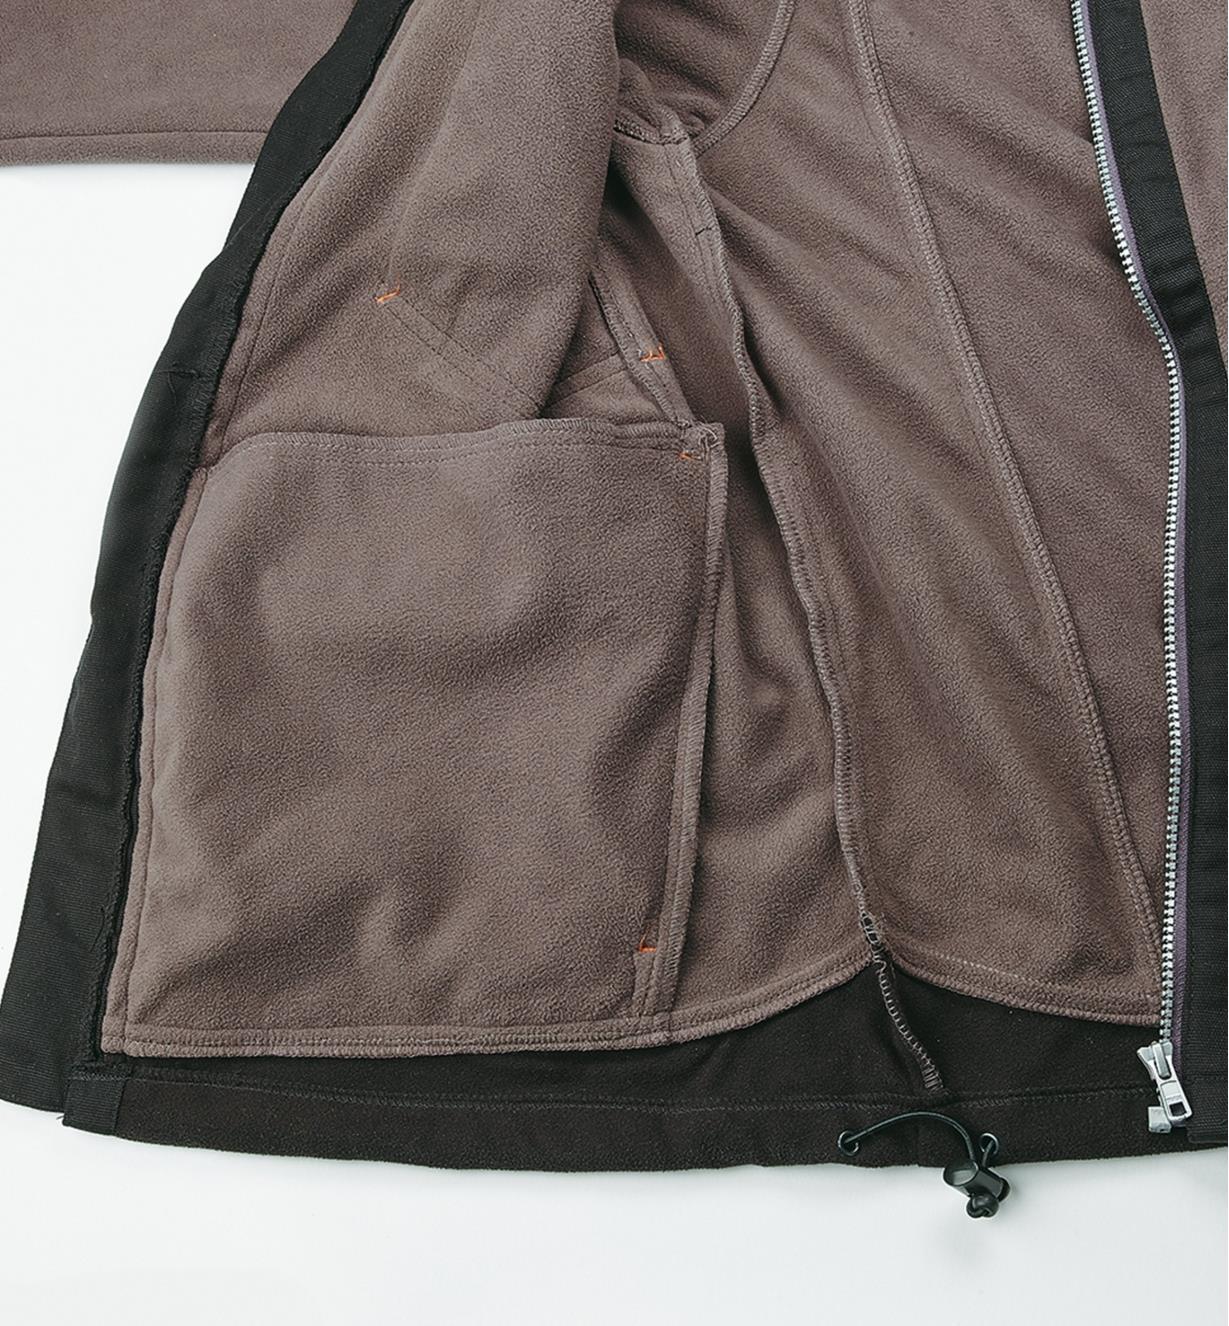 Herock Water-Resistant/Breathable Fleece Jacket